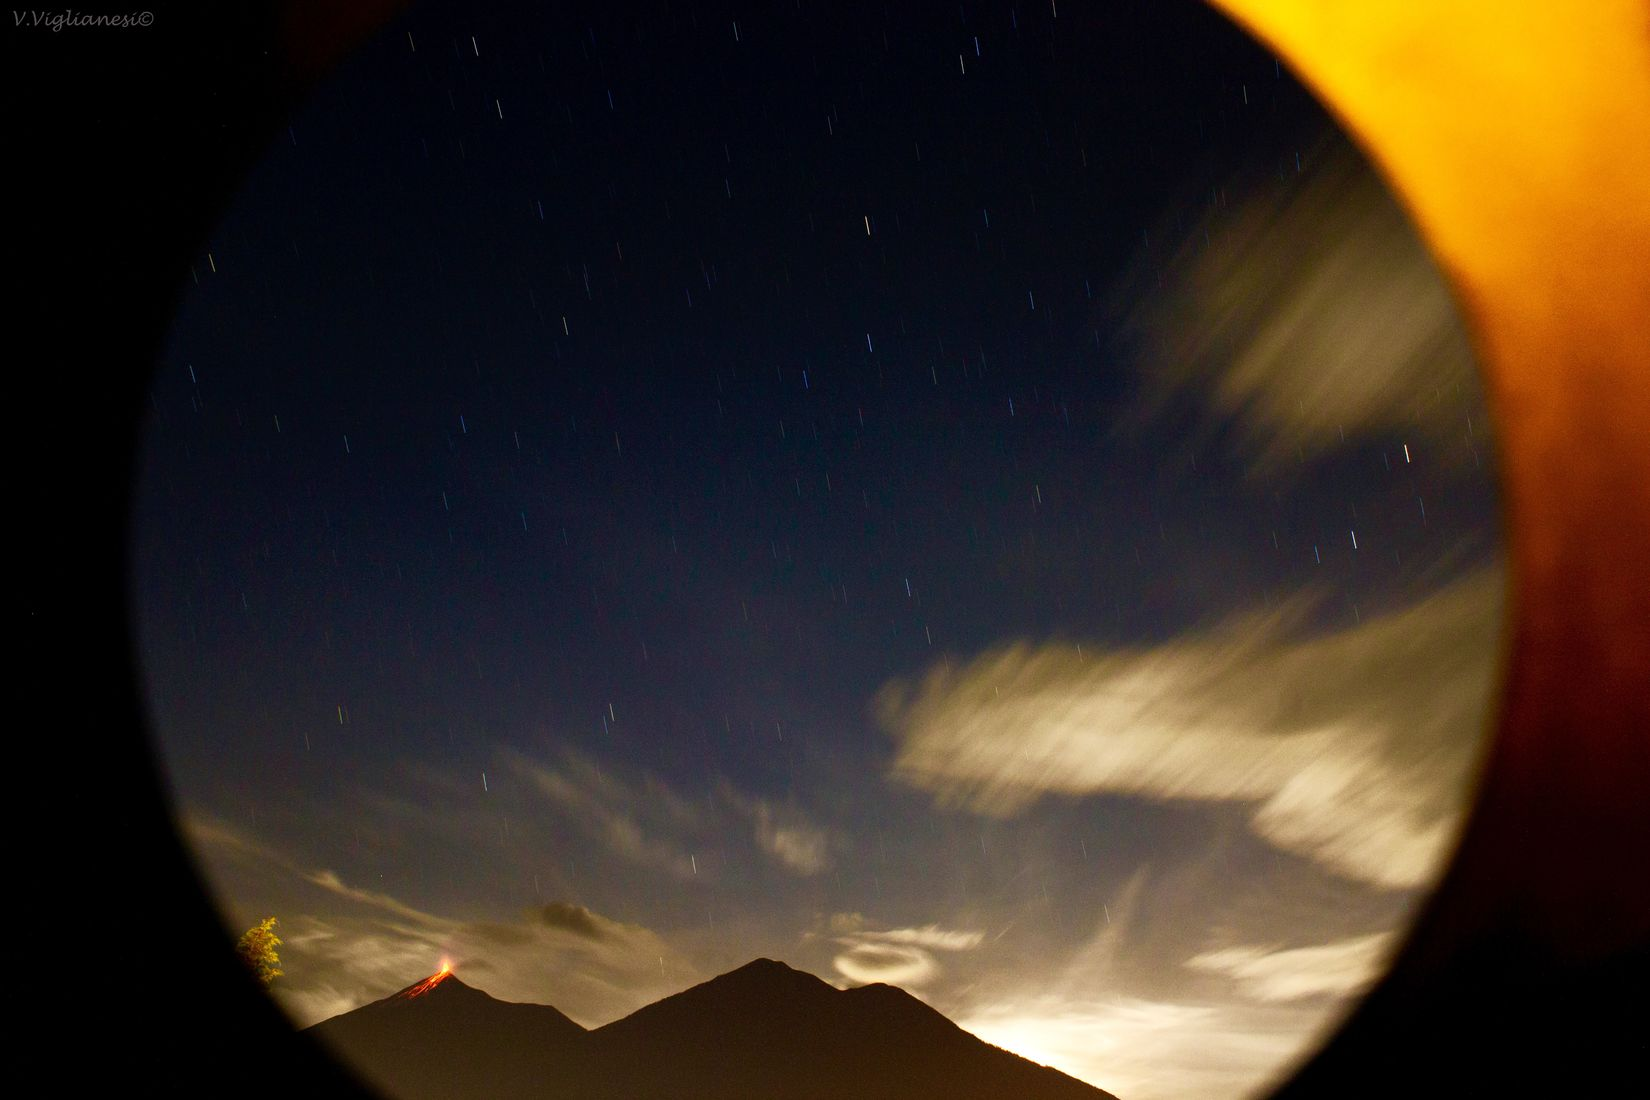 Erupción Volcánes Volcandefuego Fotografianocturna Largaexposicion Nubes PerhapsYouNeedALittleGuatemala Guatemala Tierradevolcanes Viglianesiphotography Nochemagica